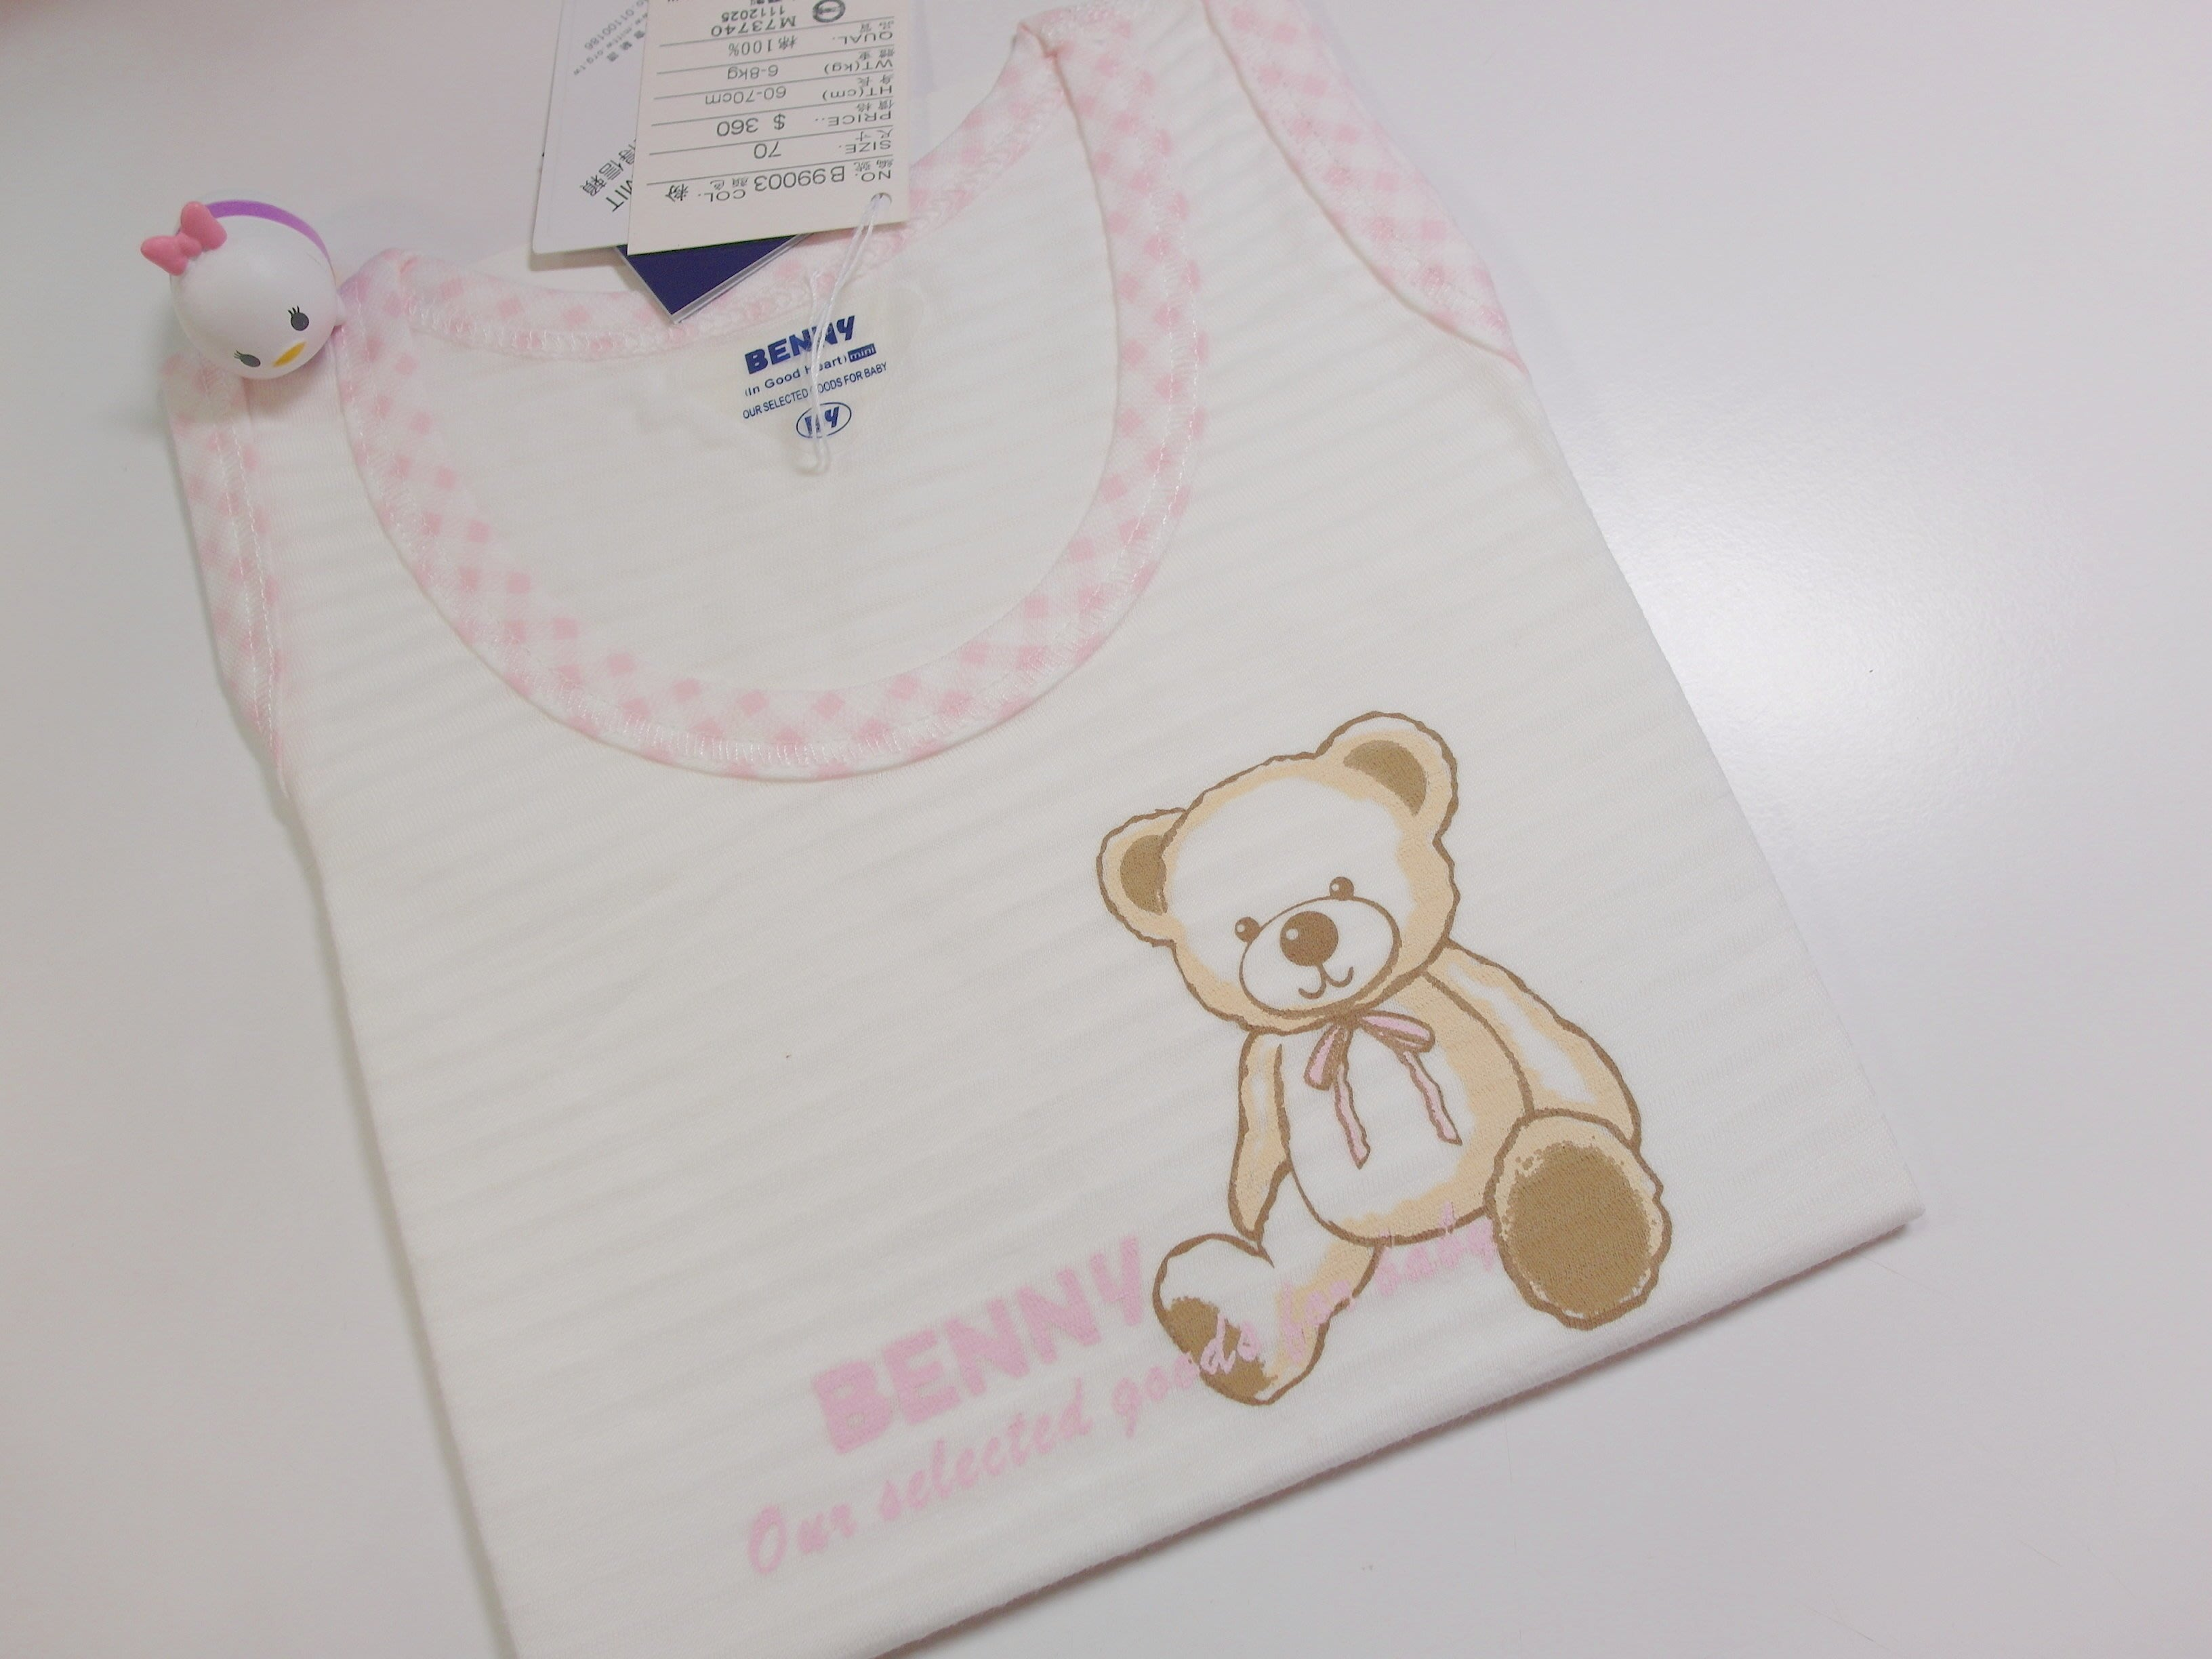 『BENNY-春夏童裝』99003 Benny Bear背心☆70/80CM(台灣製造) ☆特賣☆